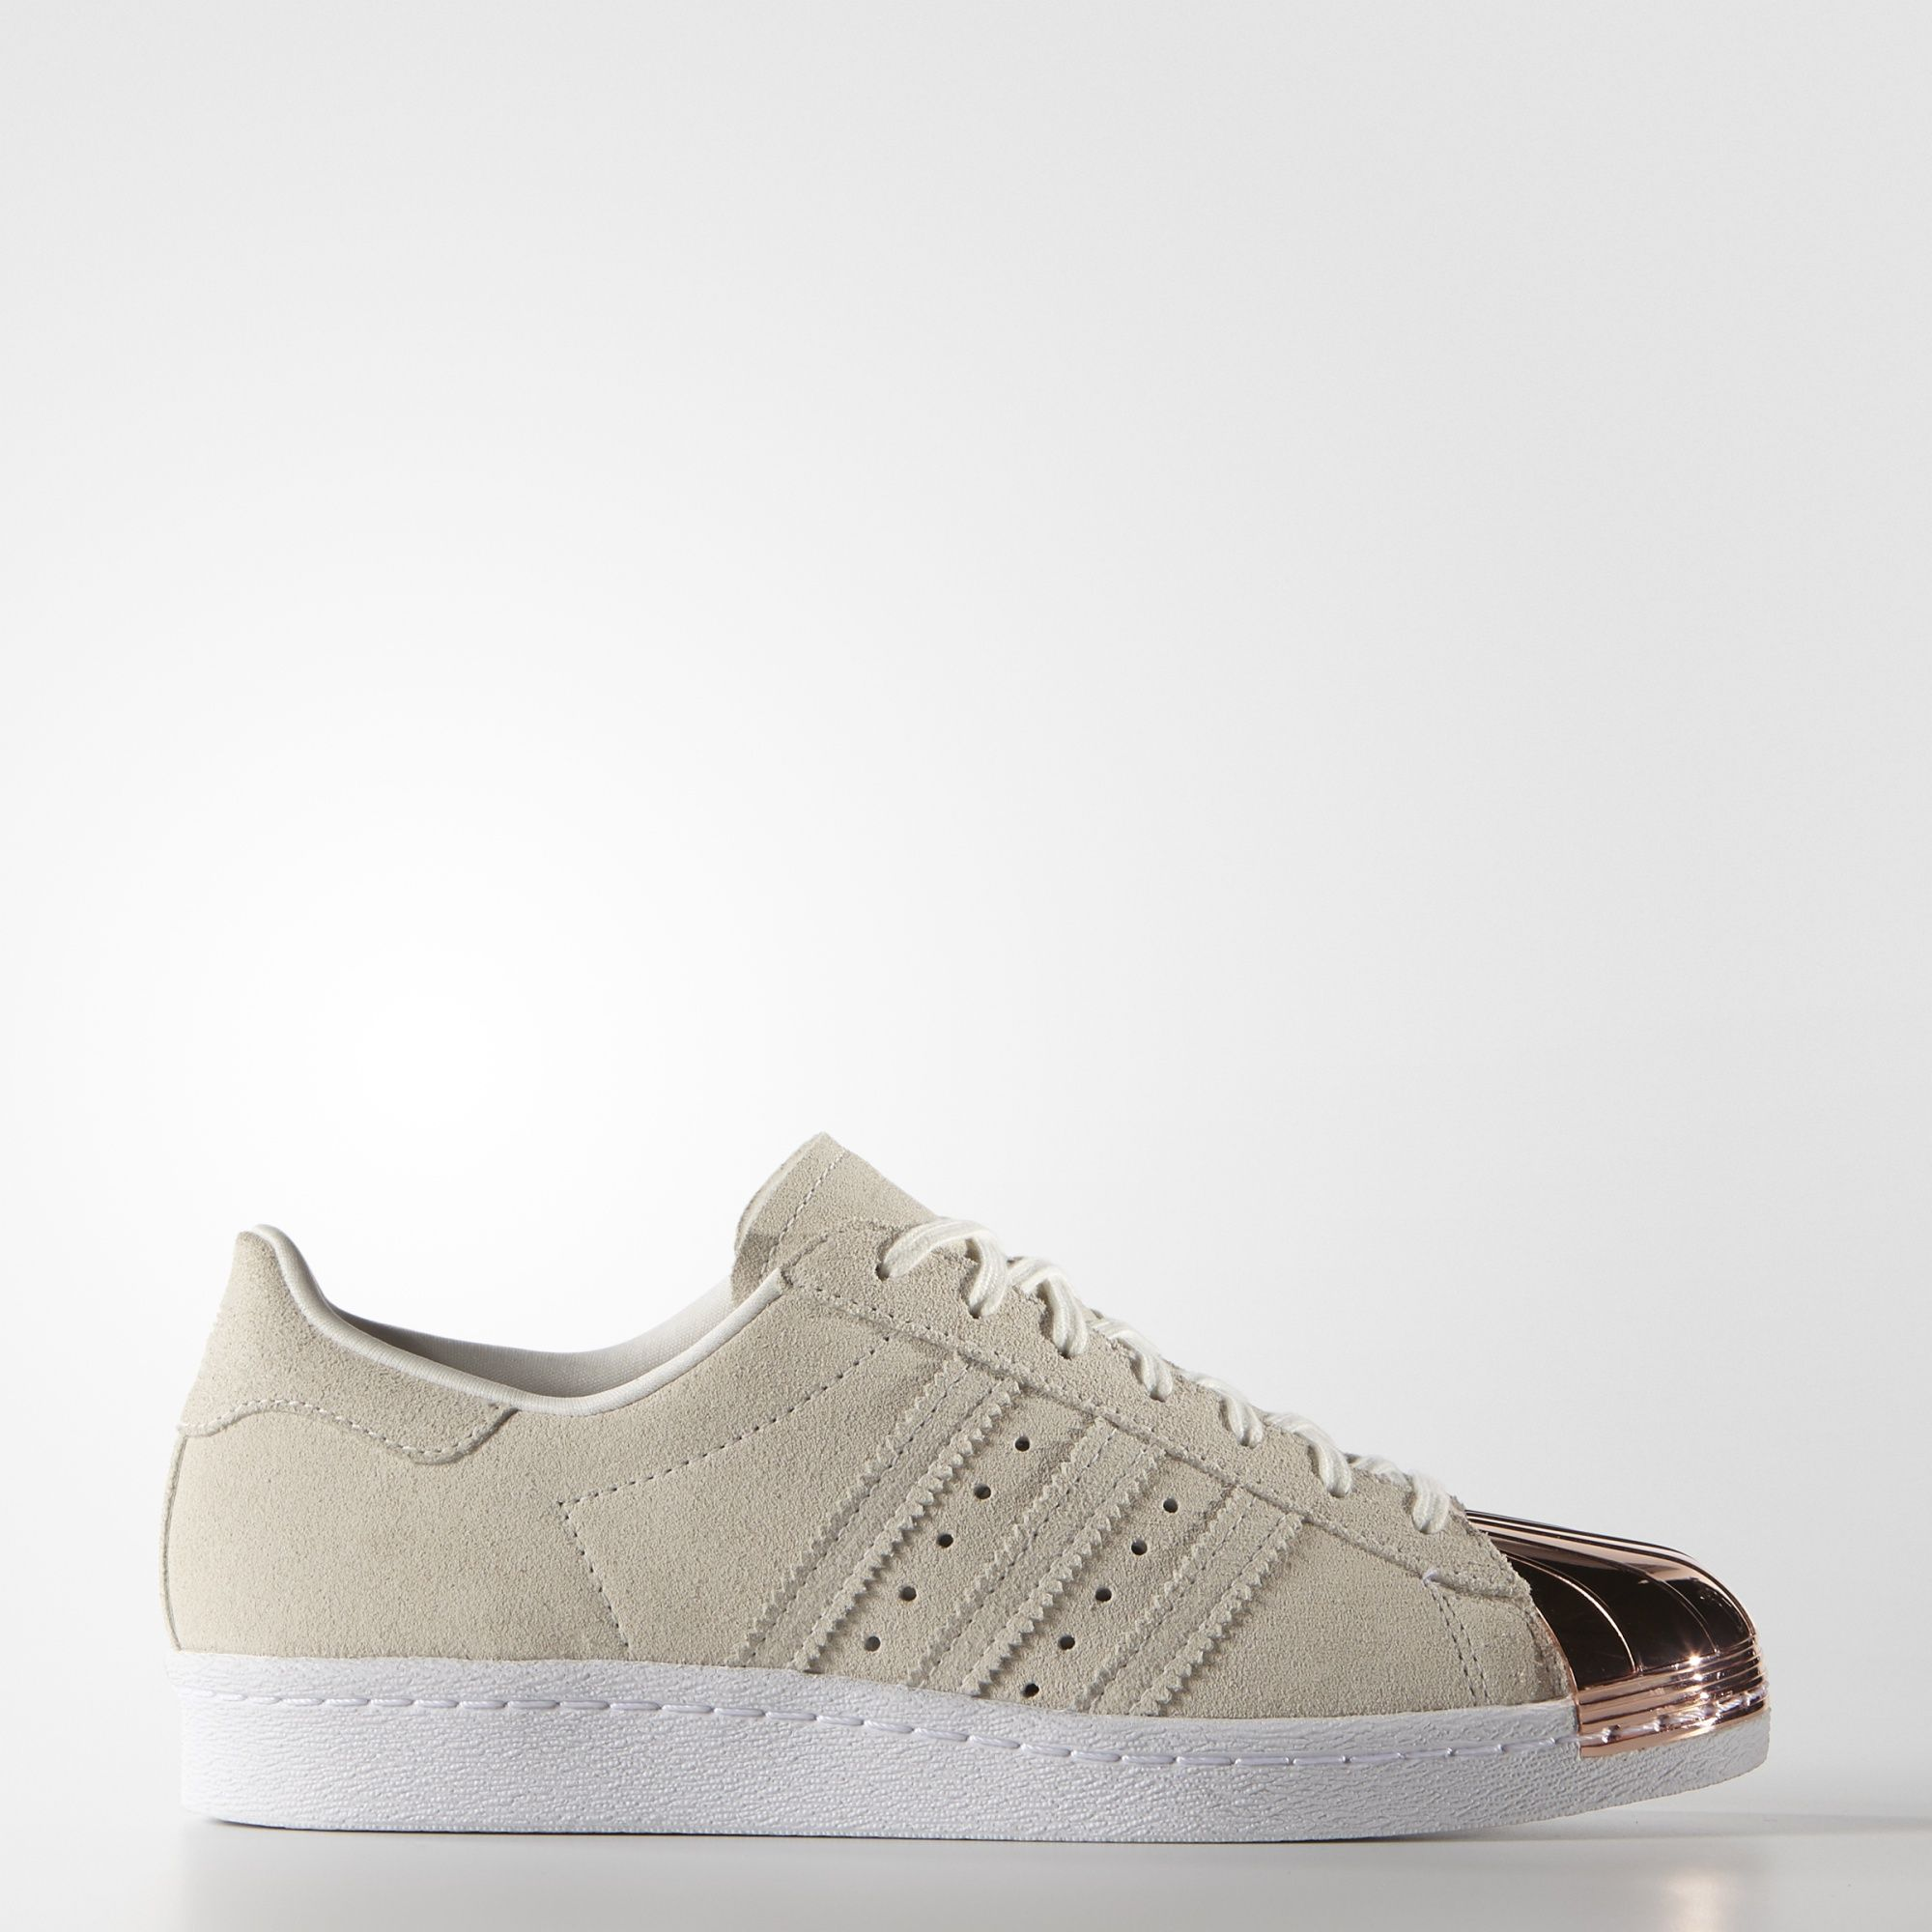 Adidas Superstar 80s turquesa